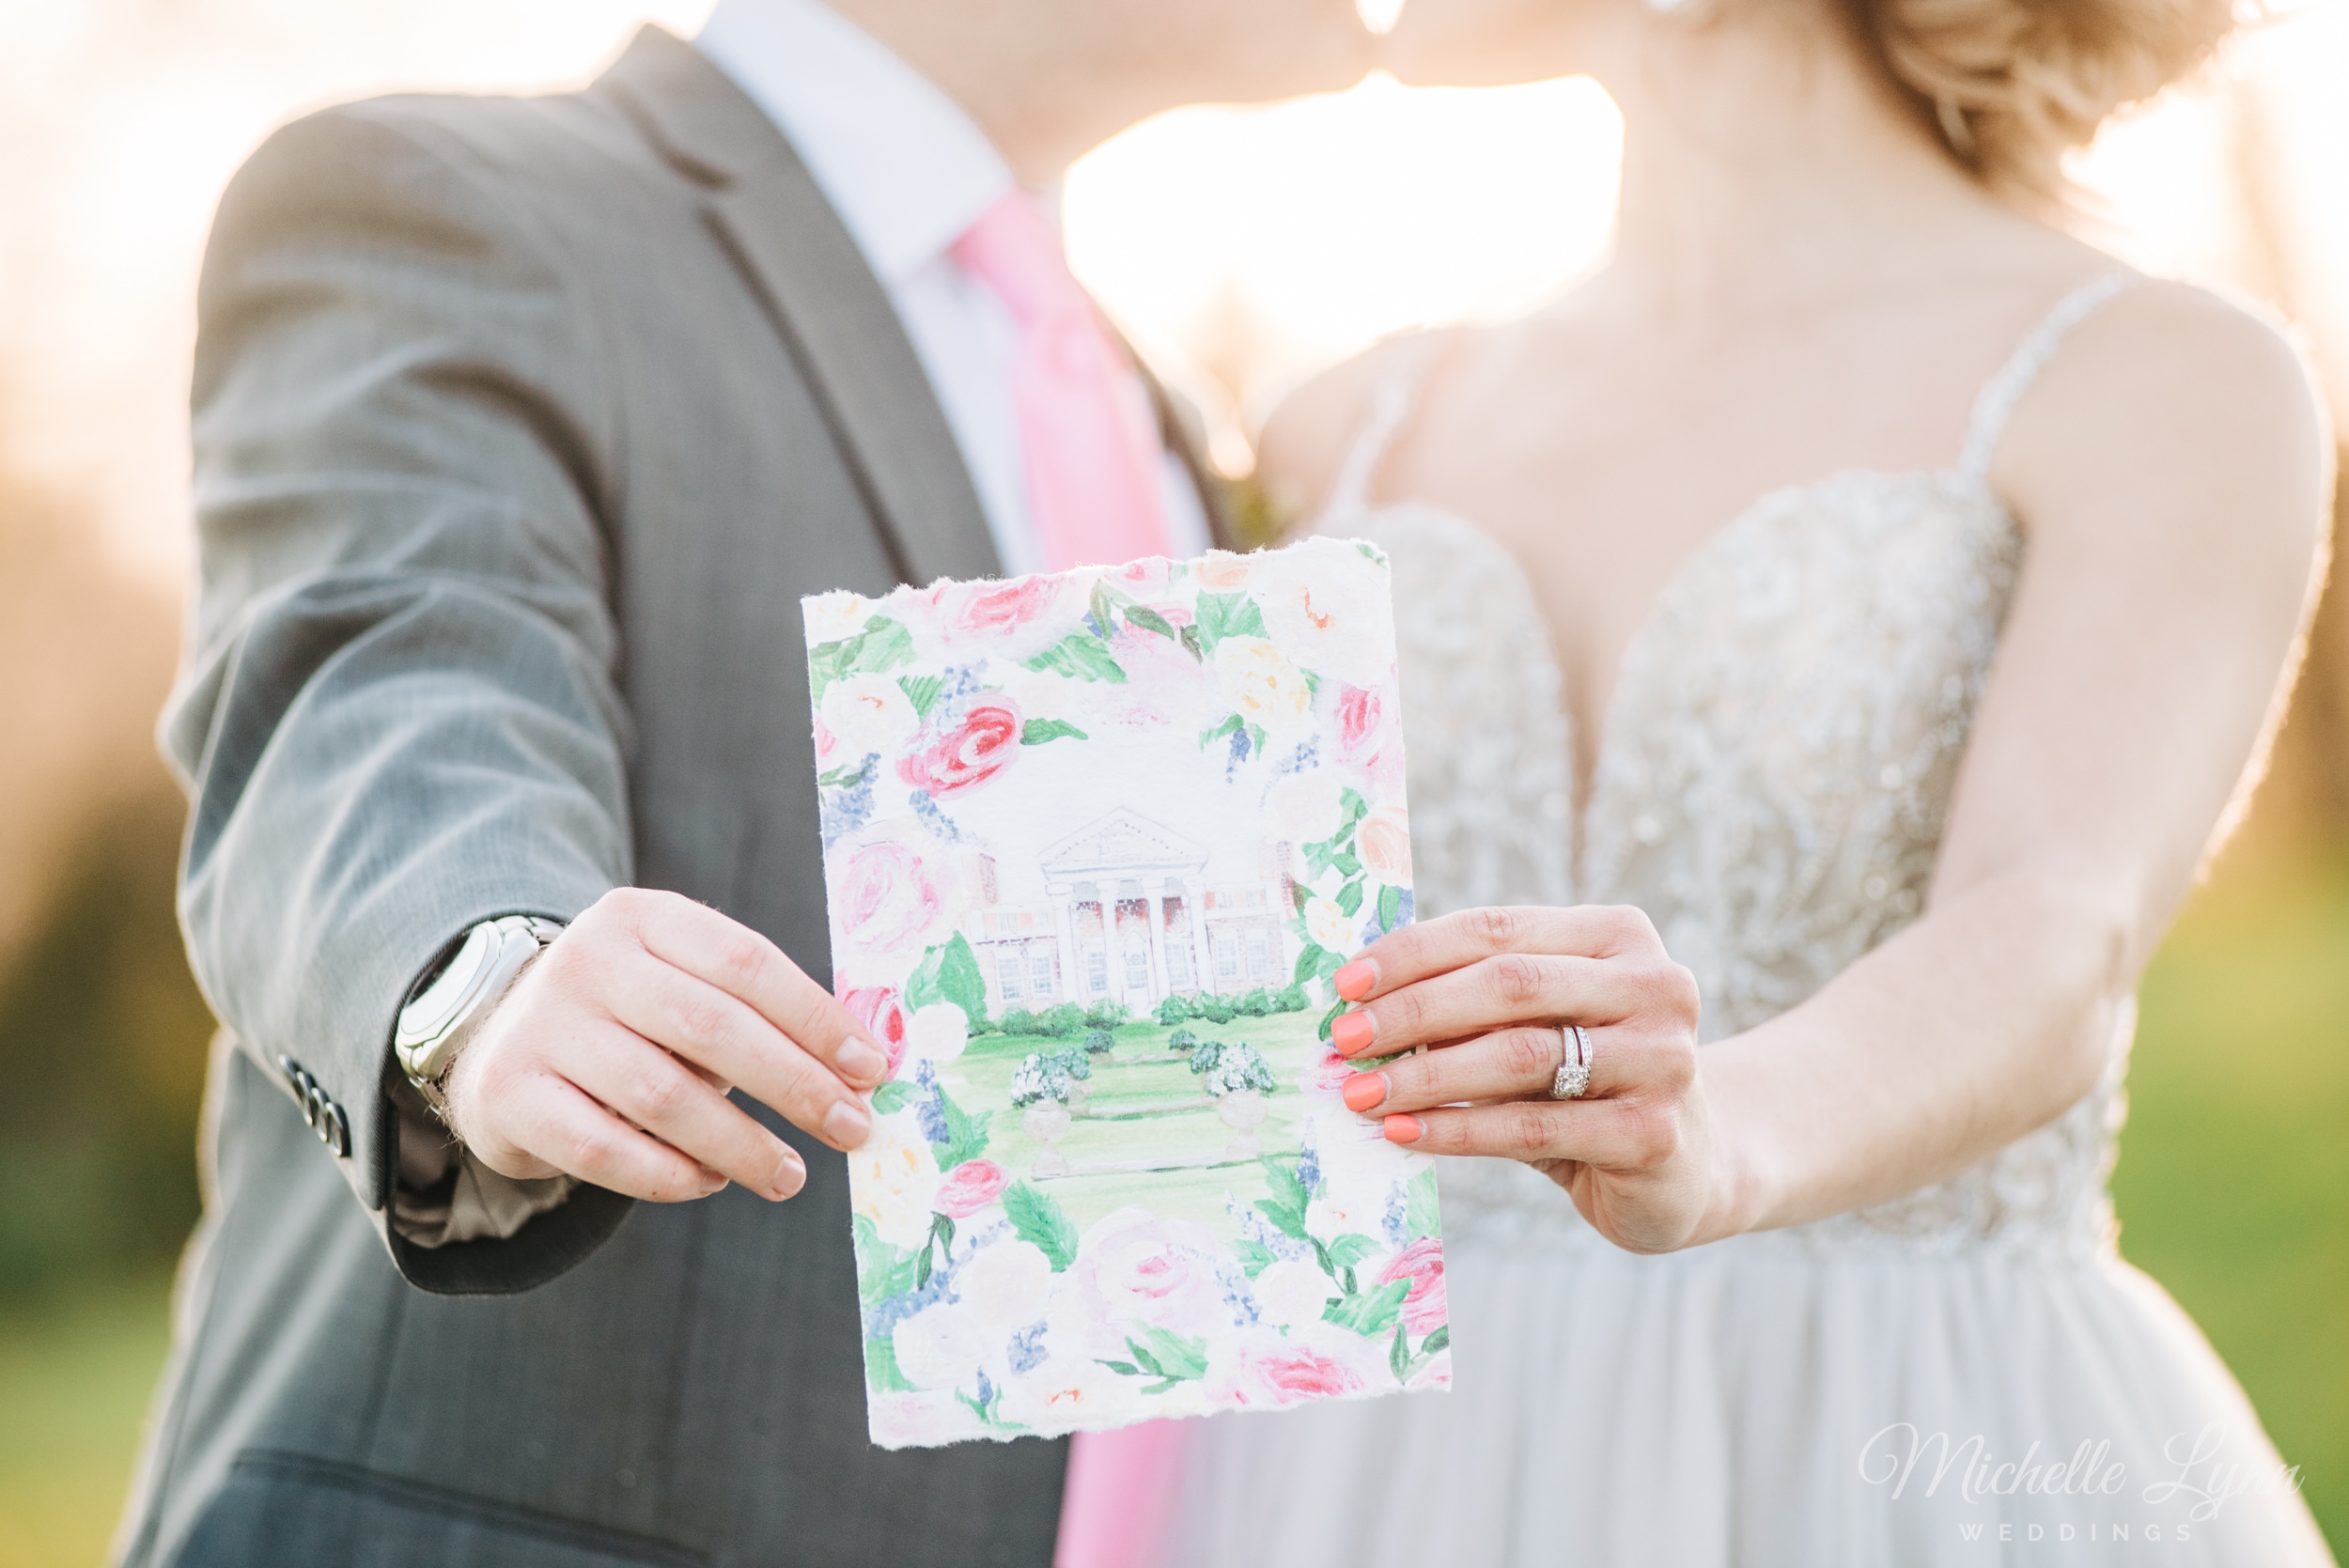 mlw-whitehall-annapolis-maryland-wedding-36.jpg